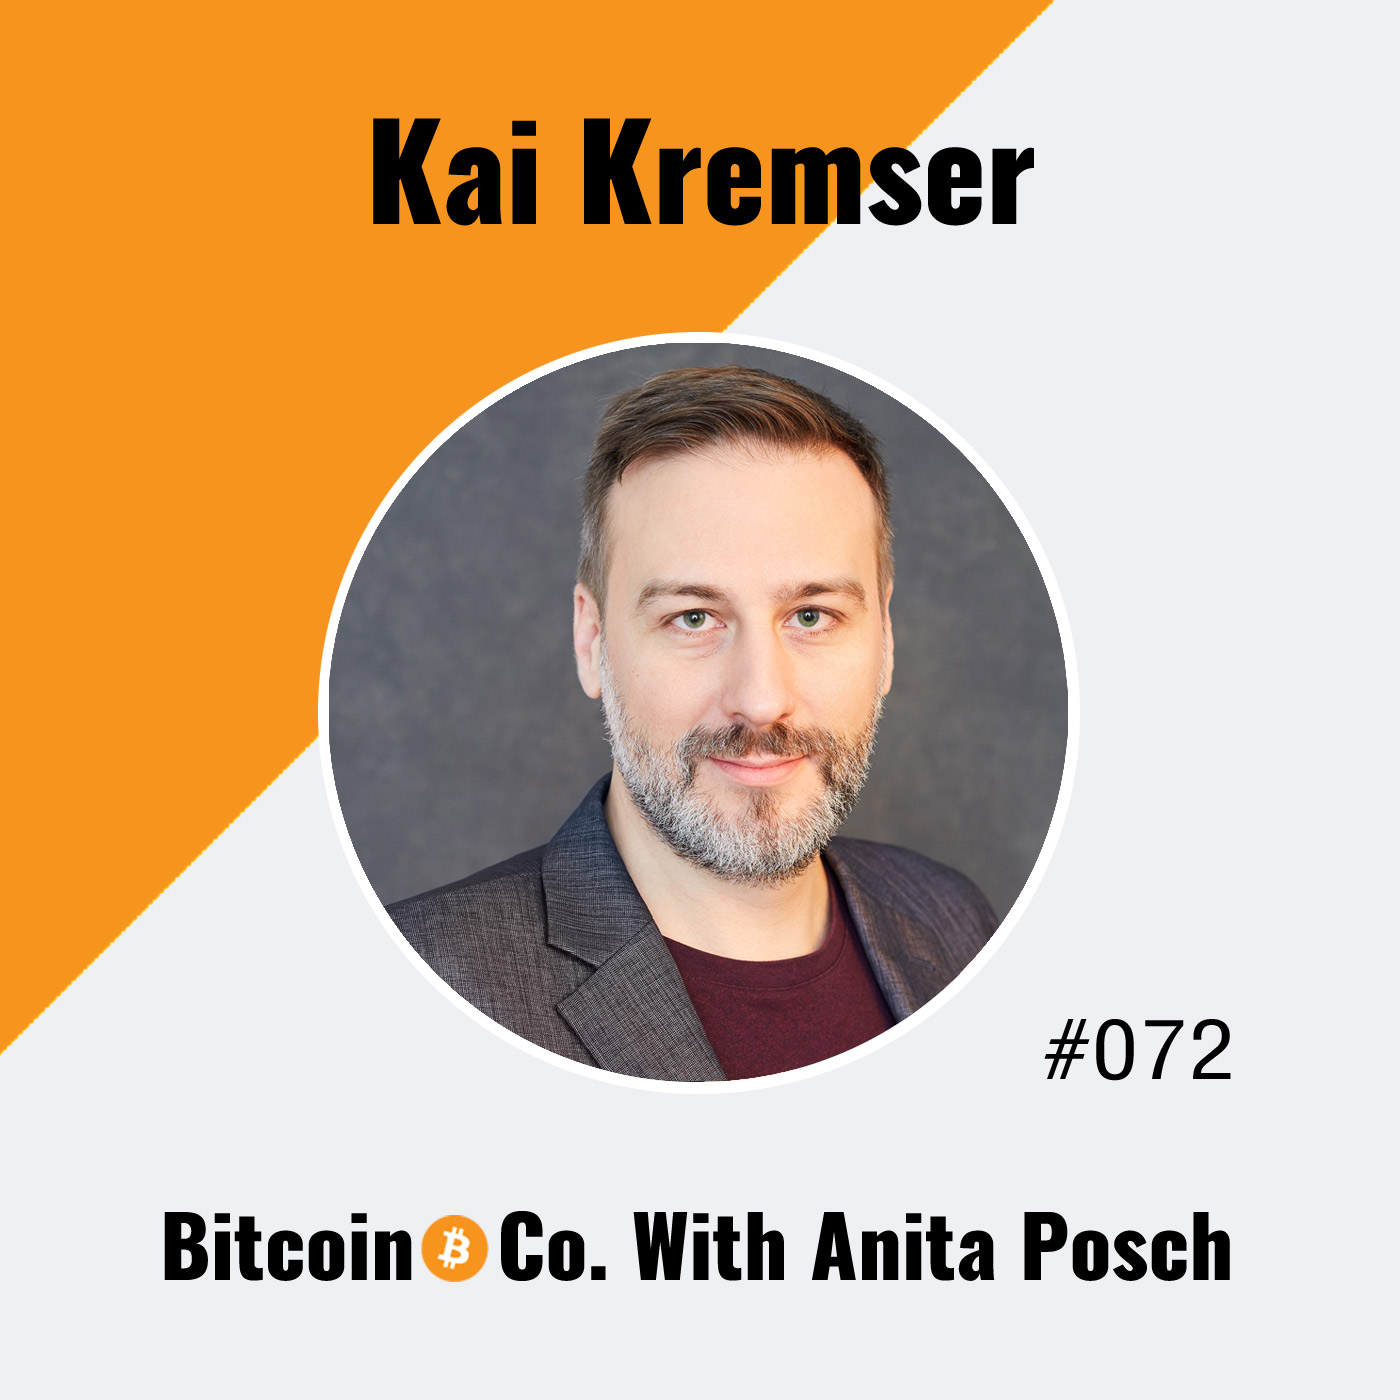 Kai Kremser: Coinfinity - Pushing Bitcoin Adoption in Austria Since 2014